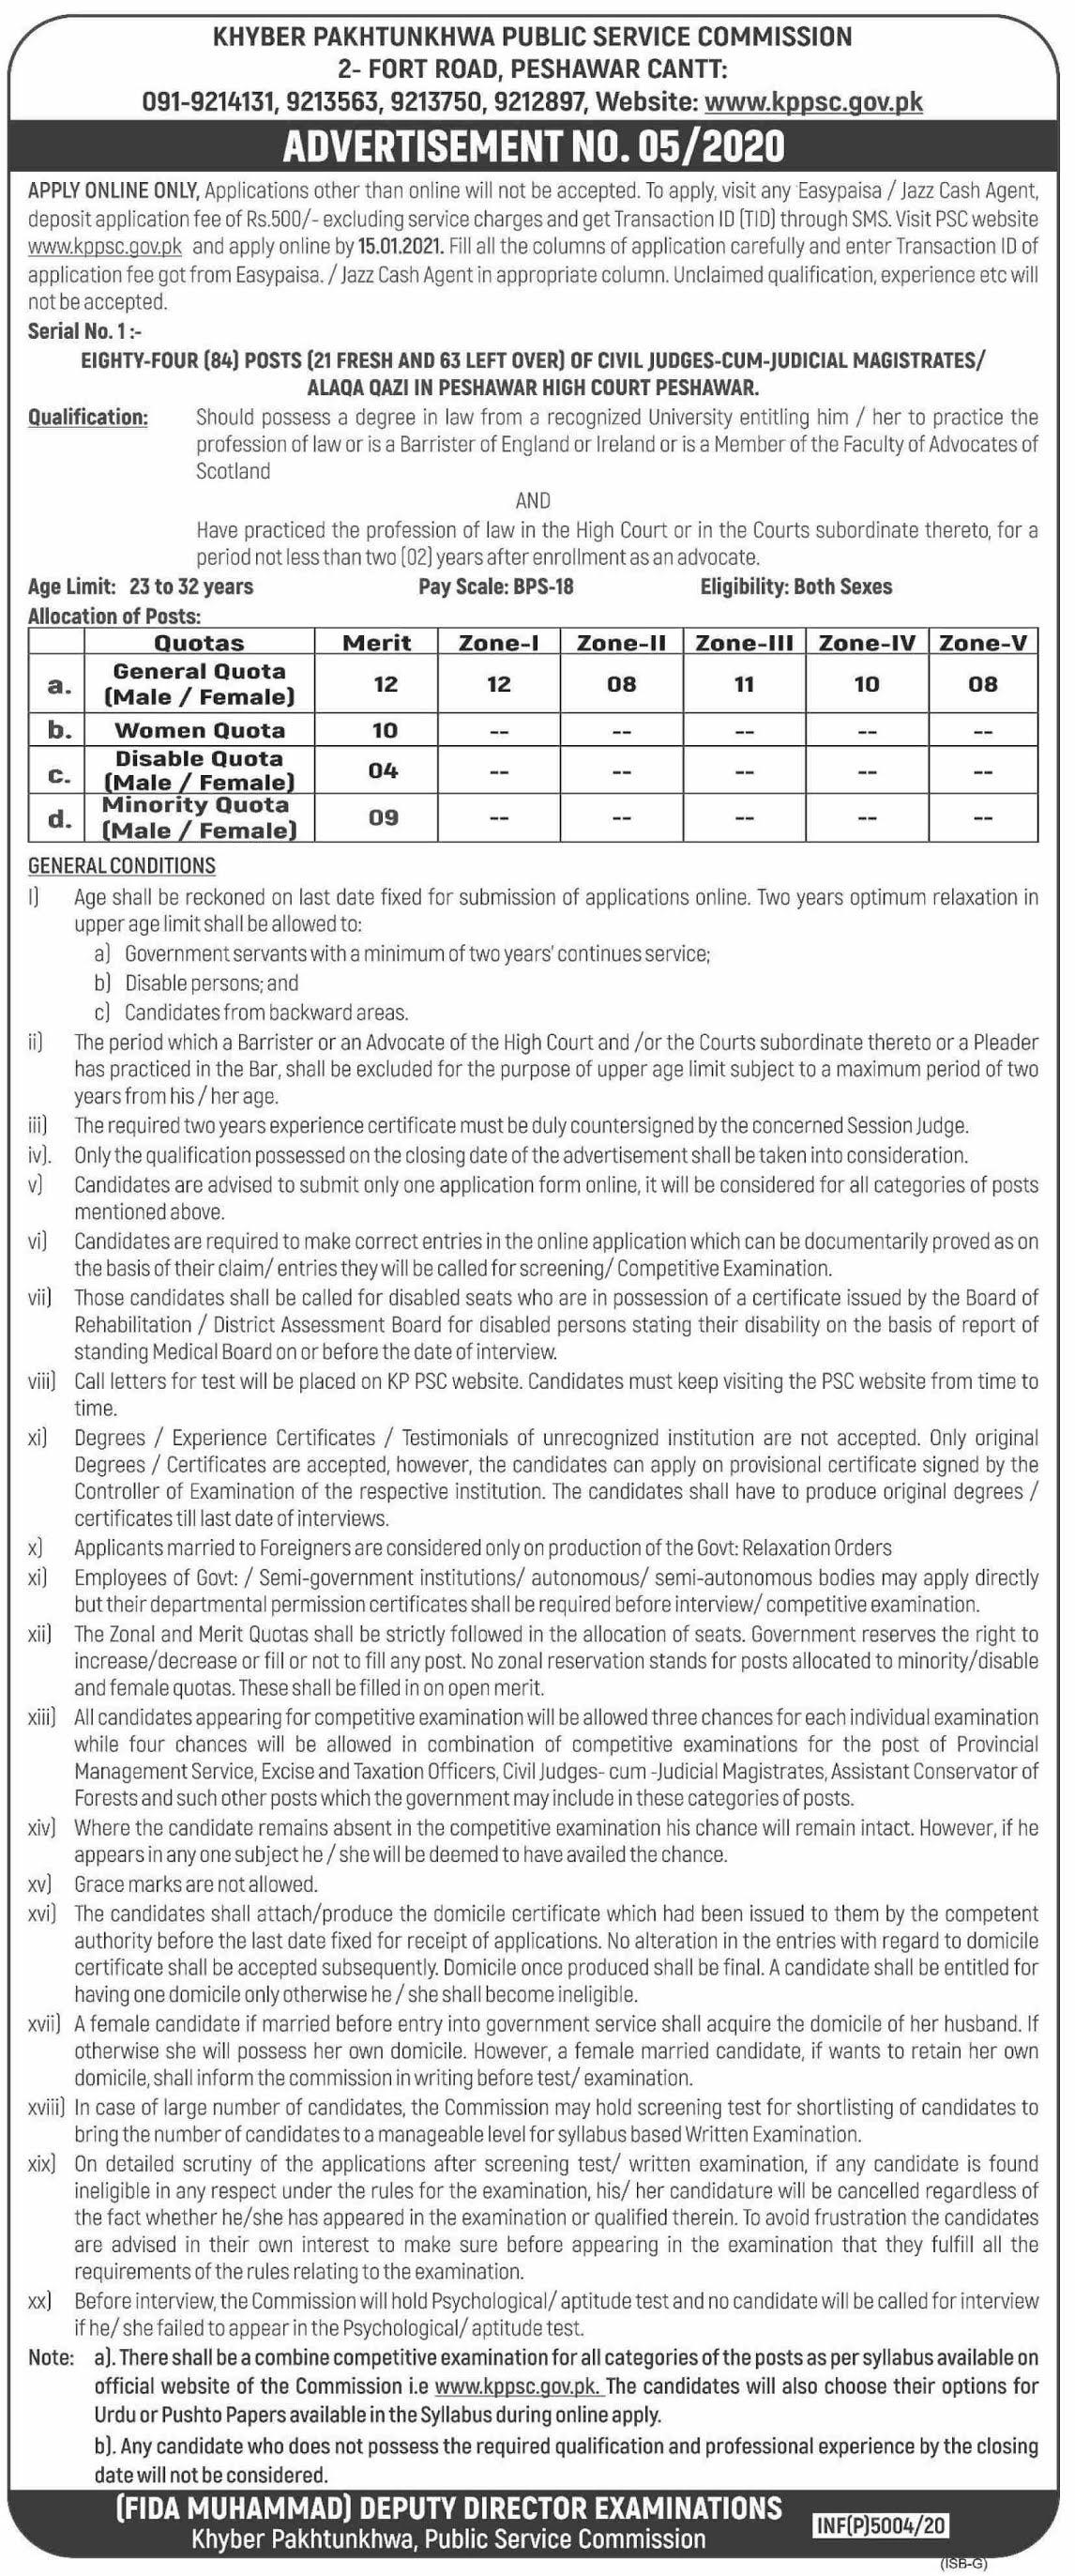 Peshawar High Court Jobs 2021 - Khyber Pakhtunkhwa Public Service Commission Jobs 2021 - KPPSC 2021 - Download KPPSC Application Form - www.kppsc.gov.pk